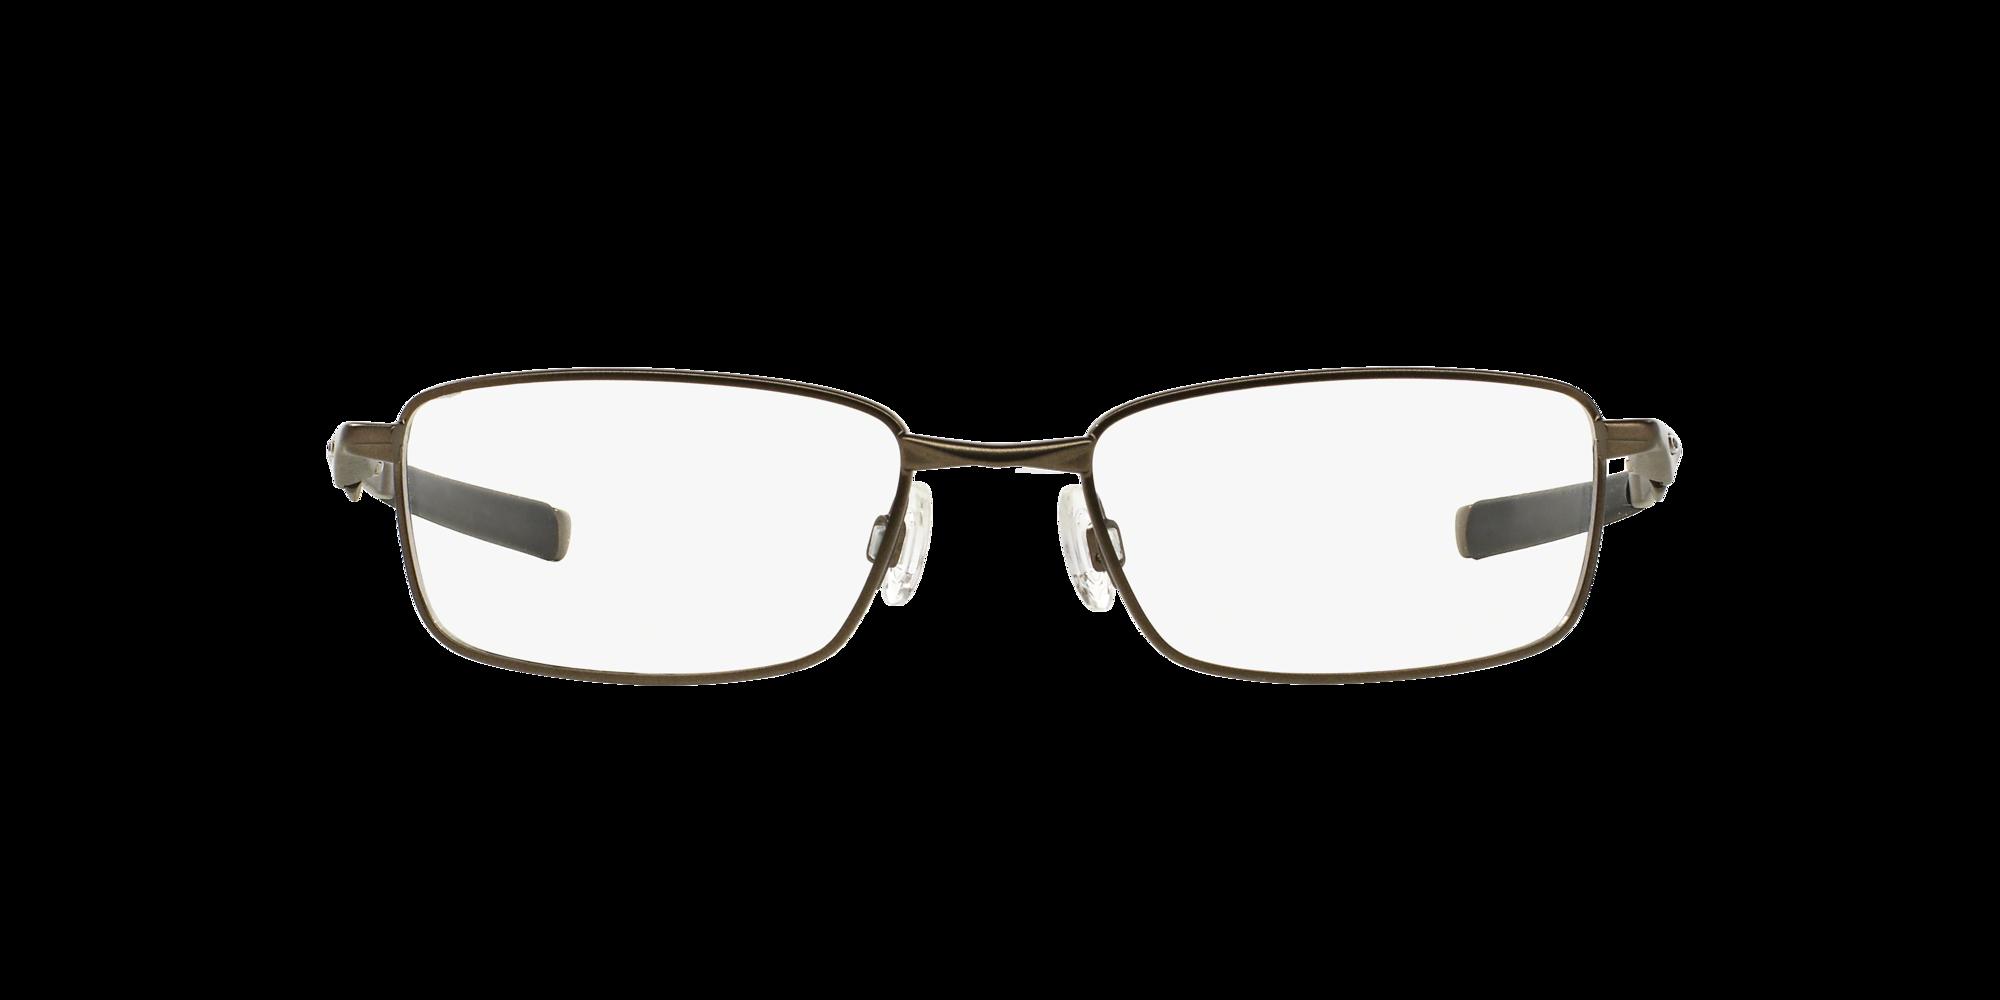 Image for OX3009 BOTTLE ROCKET 4.0 from LensCrafters | Glasses, Prescription Glasses Online, Eyewear